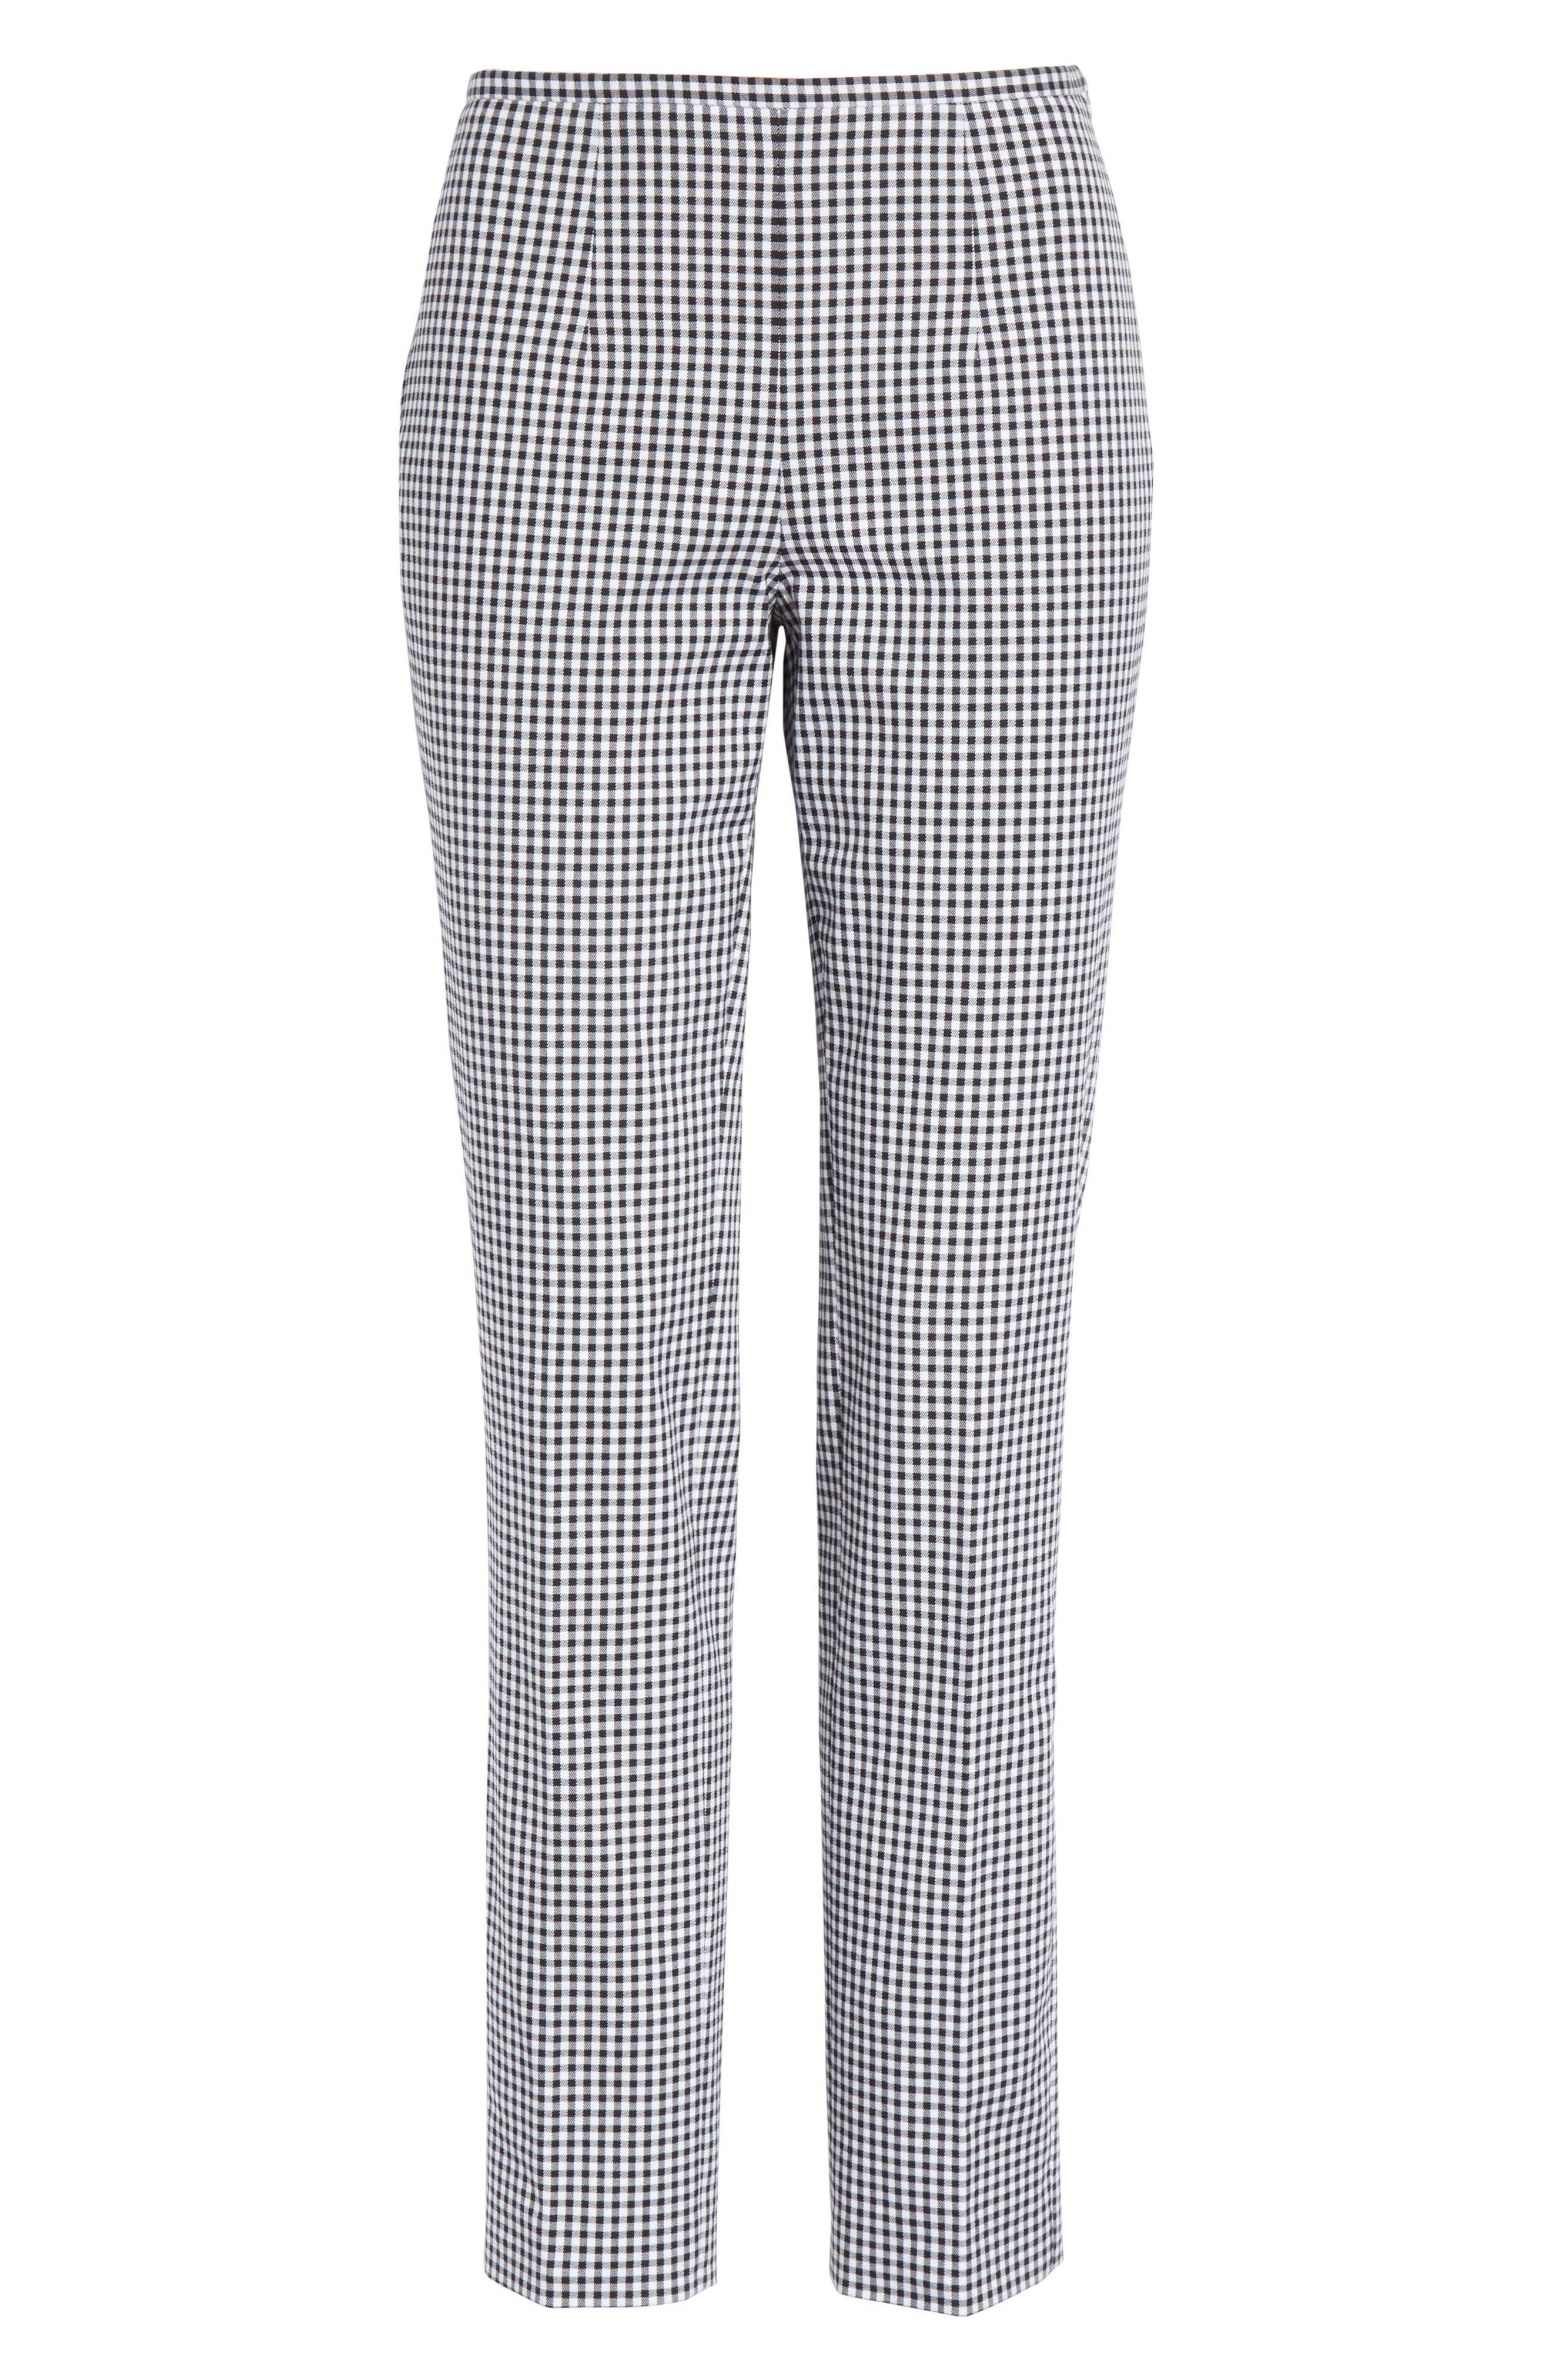 Gingham Stretch Cotton Pants,                             Alternate thumbnail 7, color,                             Black / White